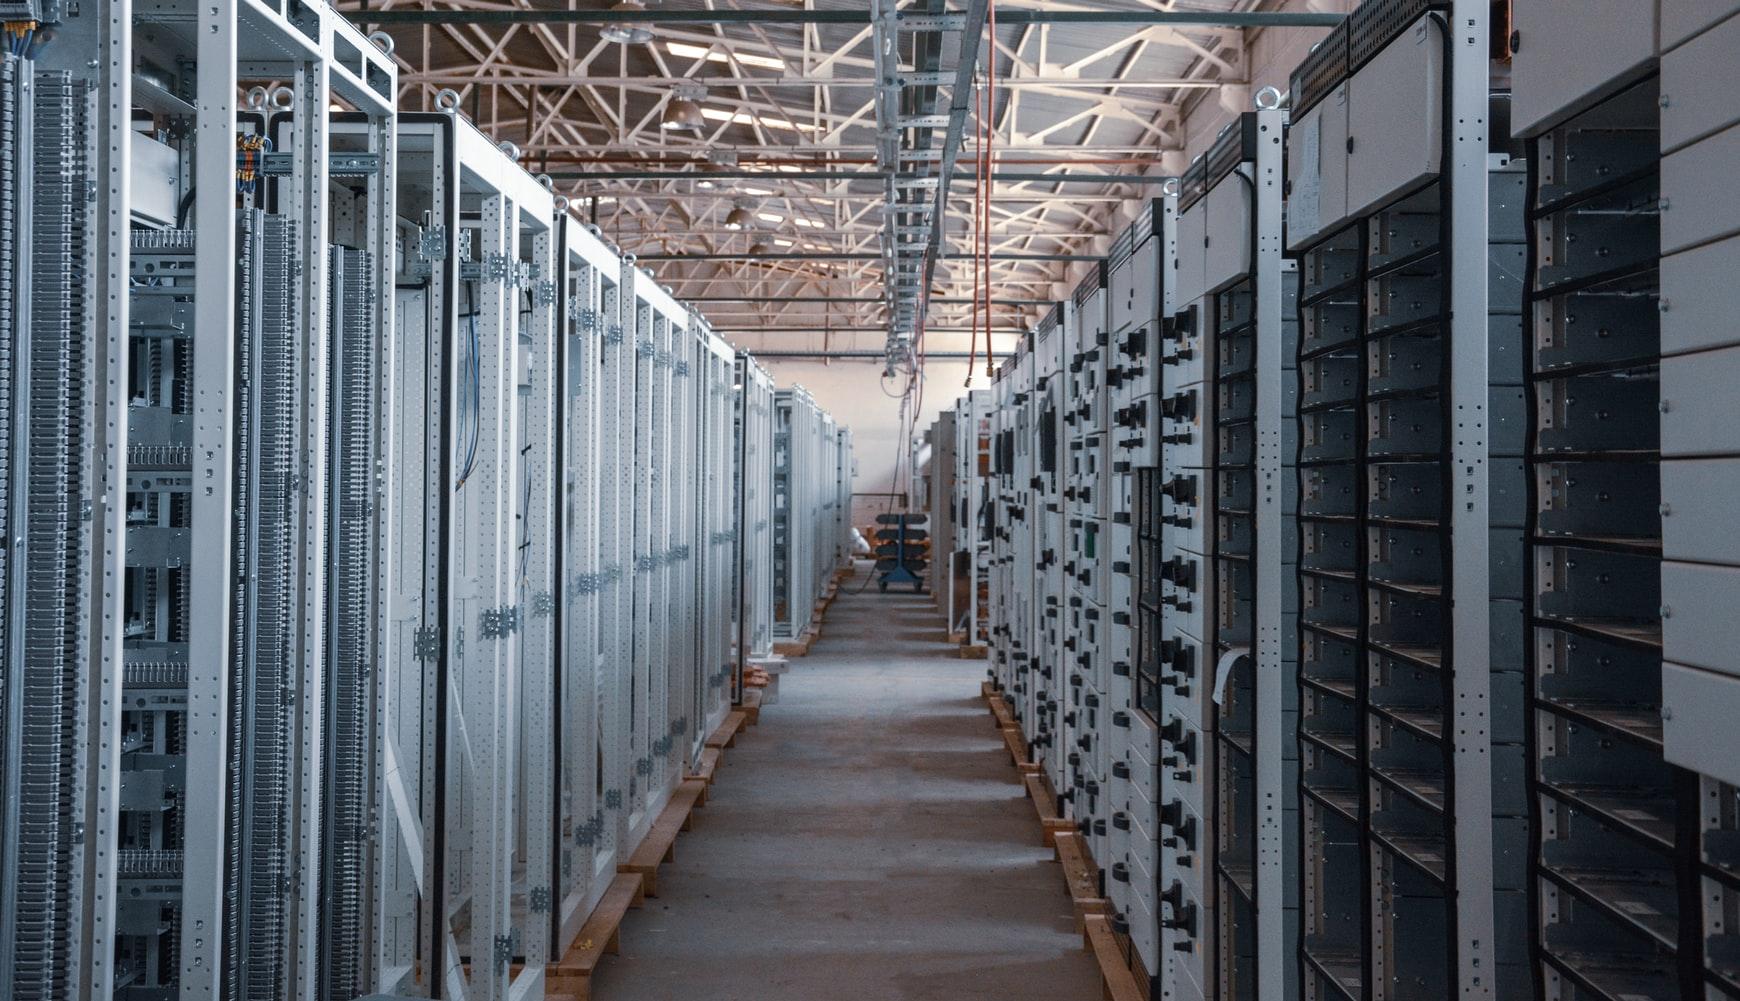 Data Center showing Servers